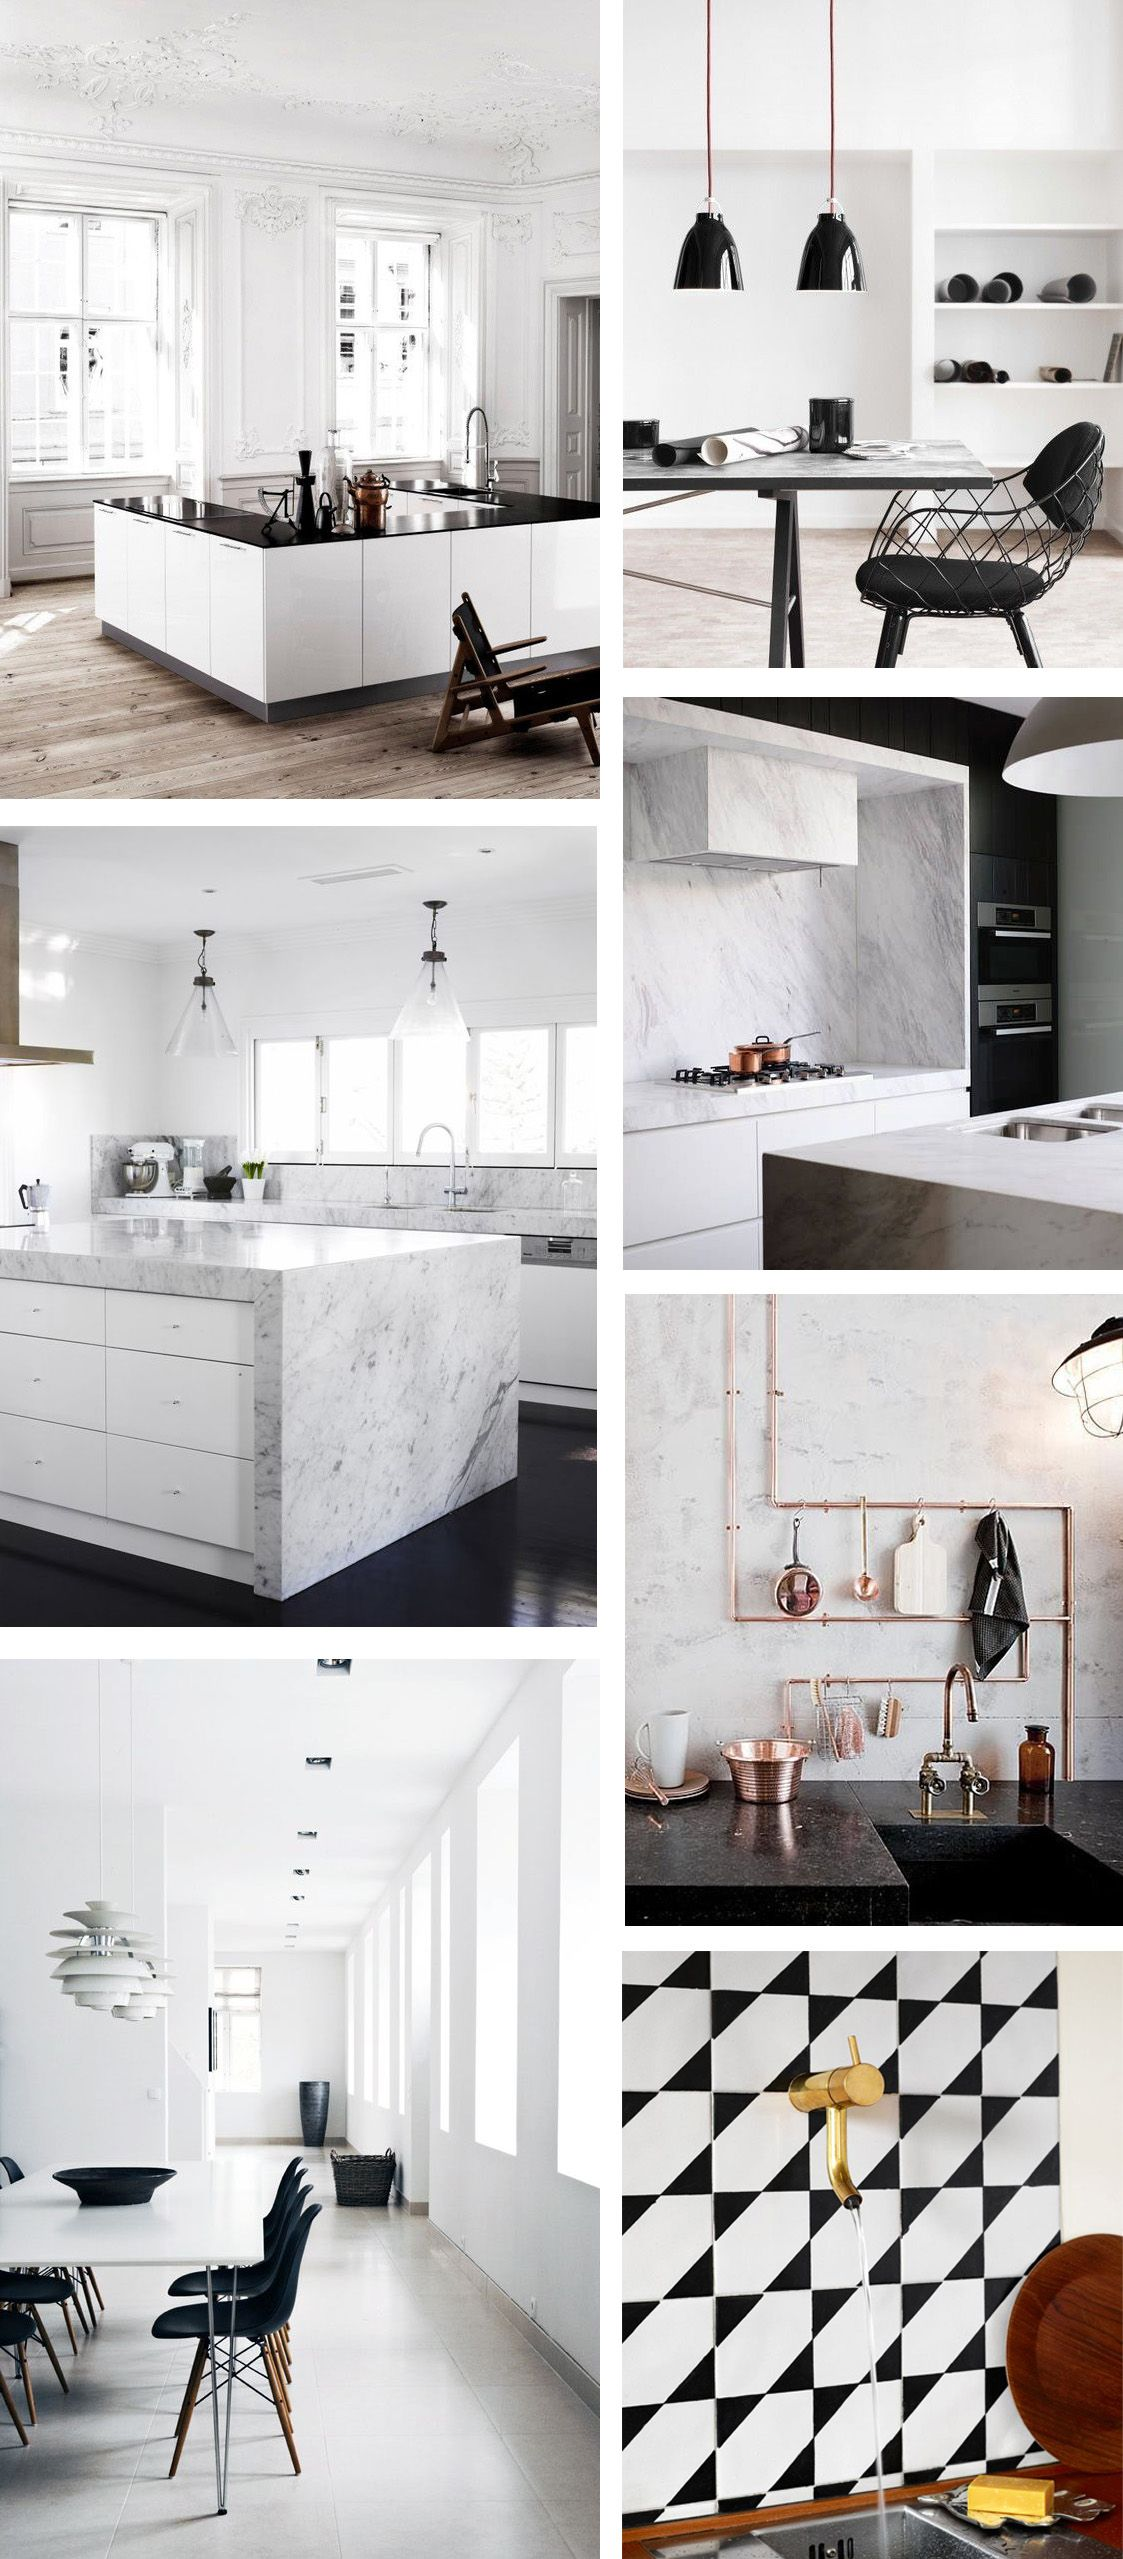 journal.alostplace.com: KITCHEN INSPIRATION | interior design ...